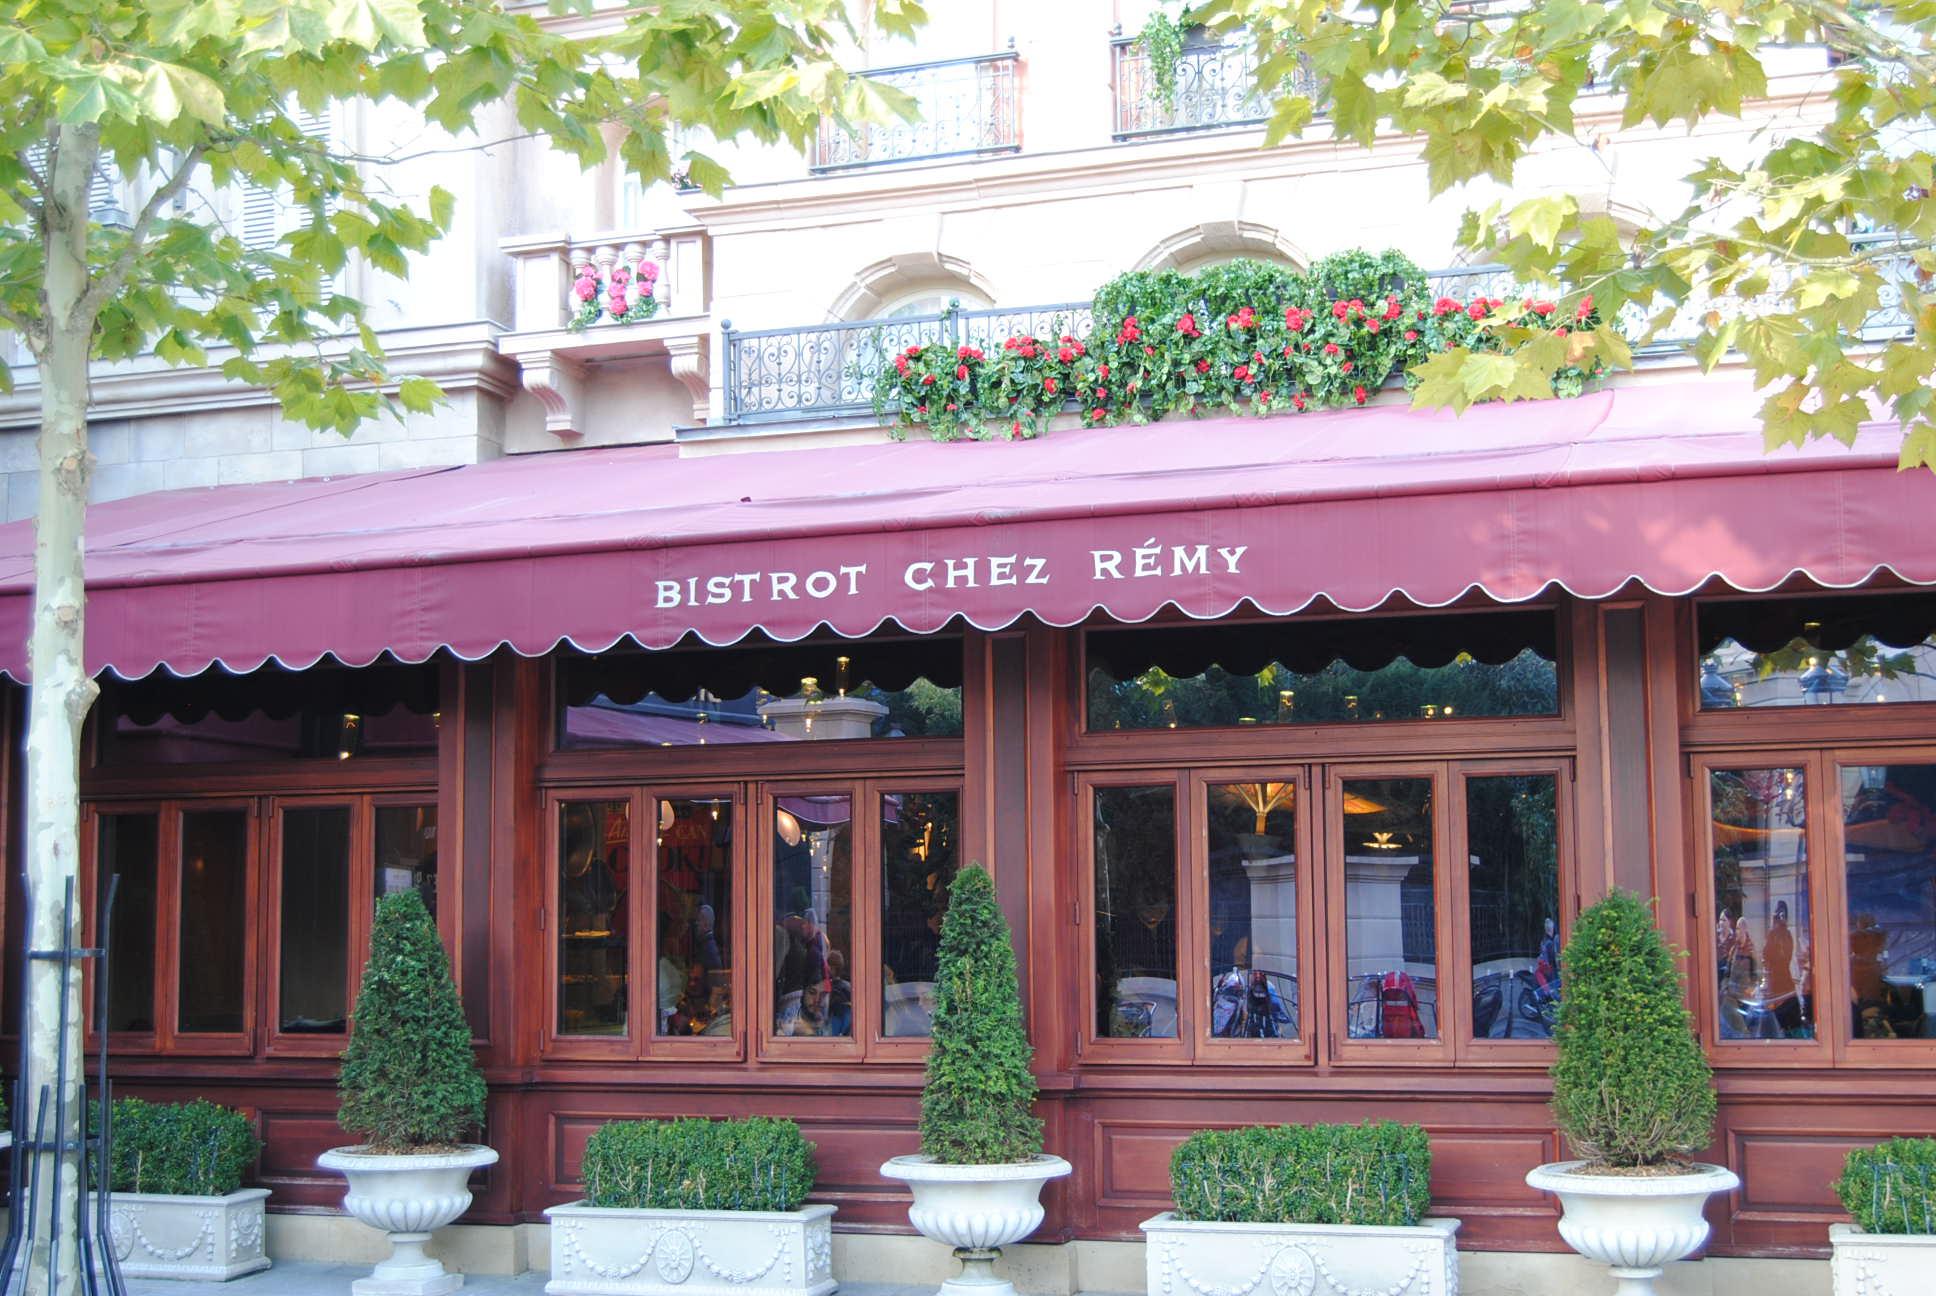 bistrot-chez-remy-ratatouille-movie-disneyland-paris-eat